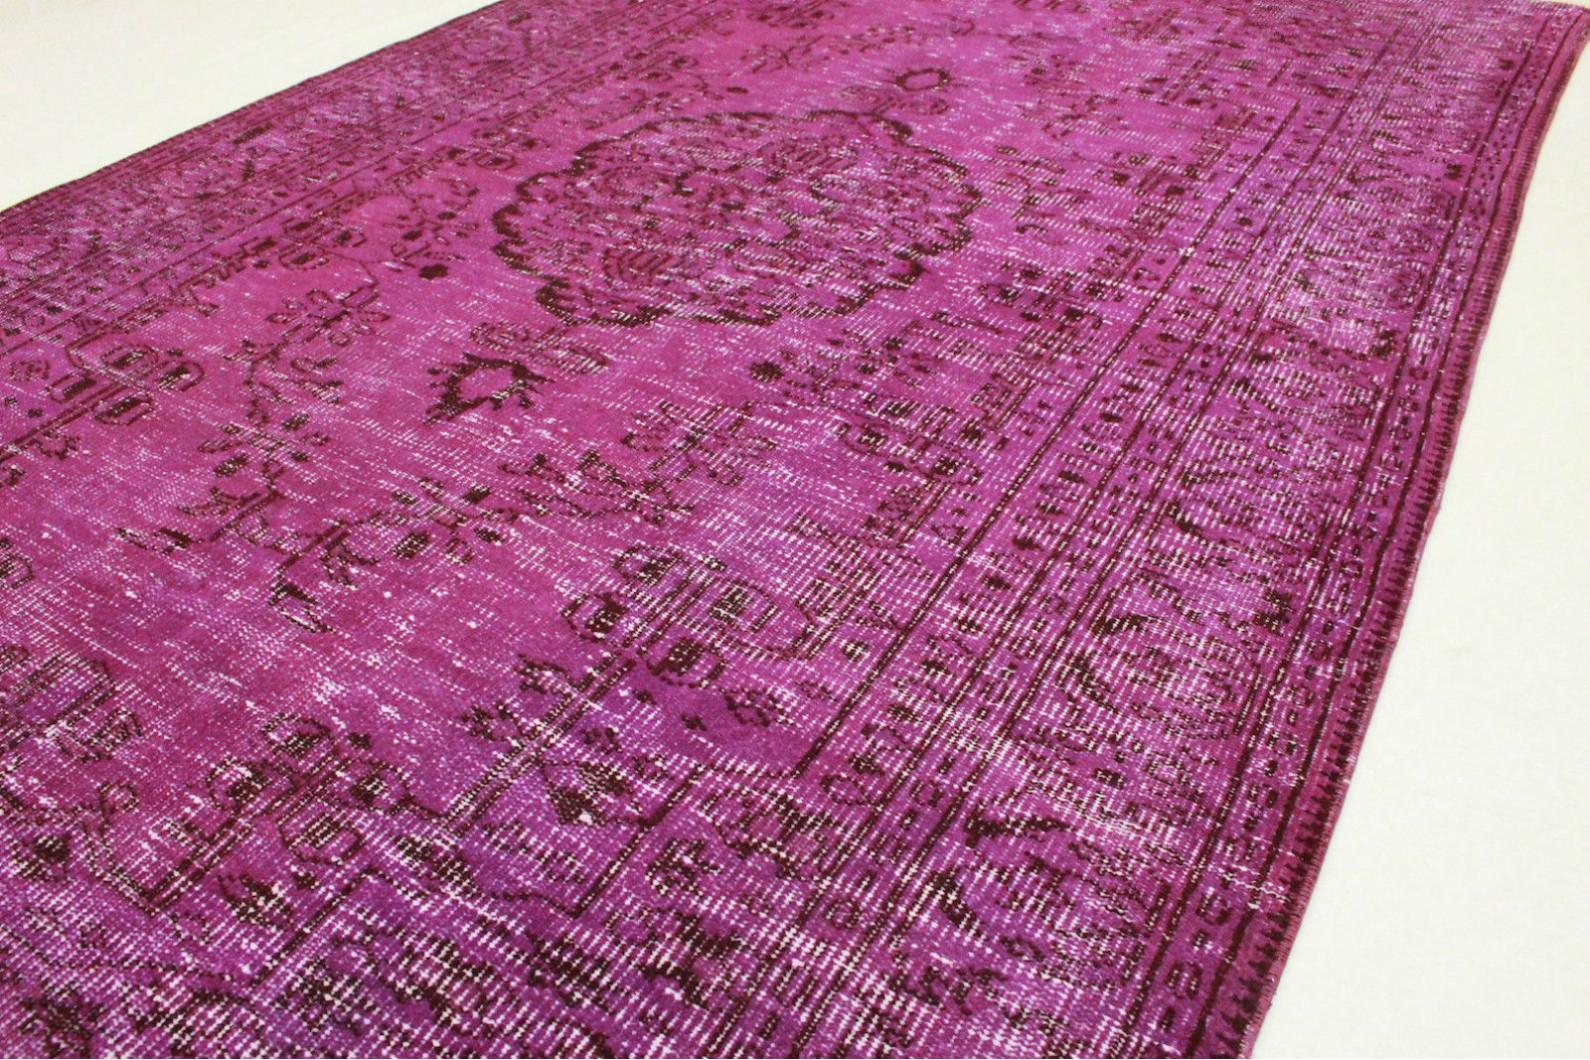 vintage teppich lila in 280x170cm 1011 5133 bei kaufen. Black Bedroom Furniture Sets. Home Design Ideas